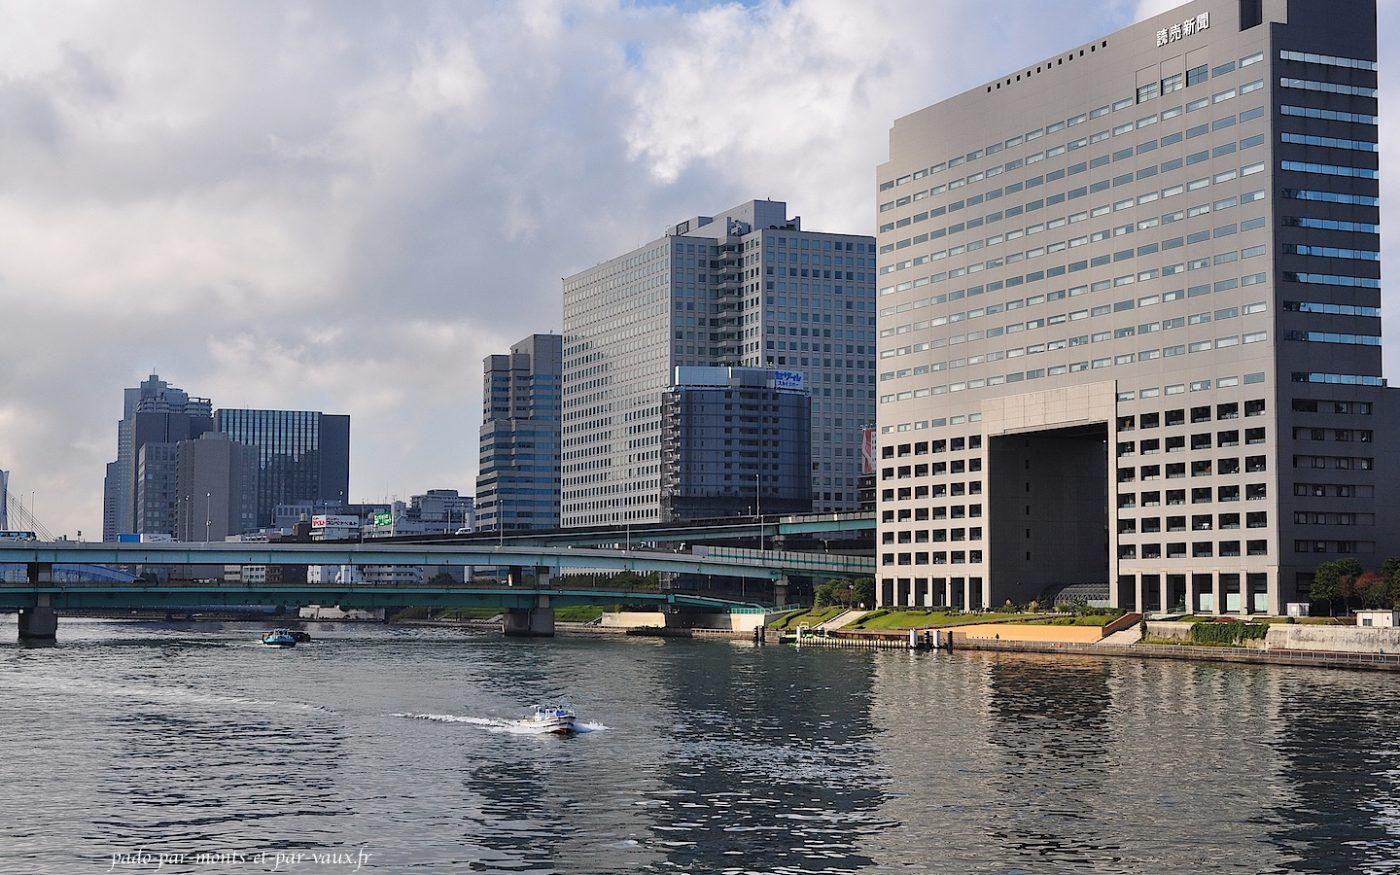 Traversée de la Sumida